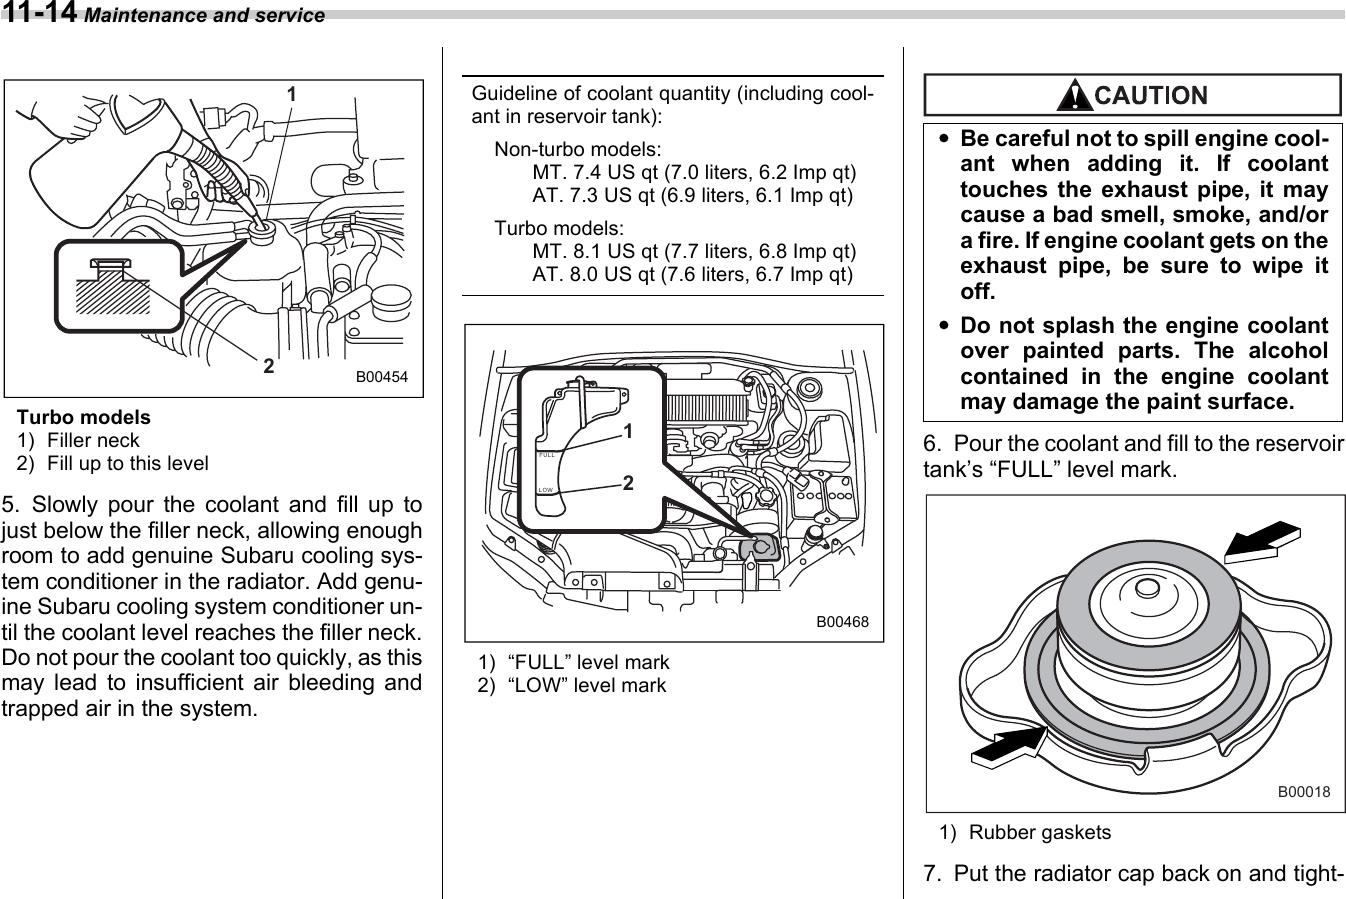 Subaru 2006 Impreza Maintenance And Service Guide